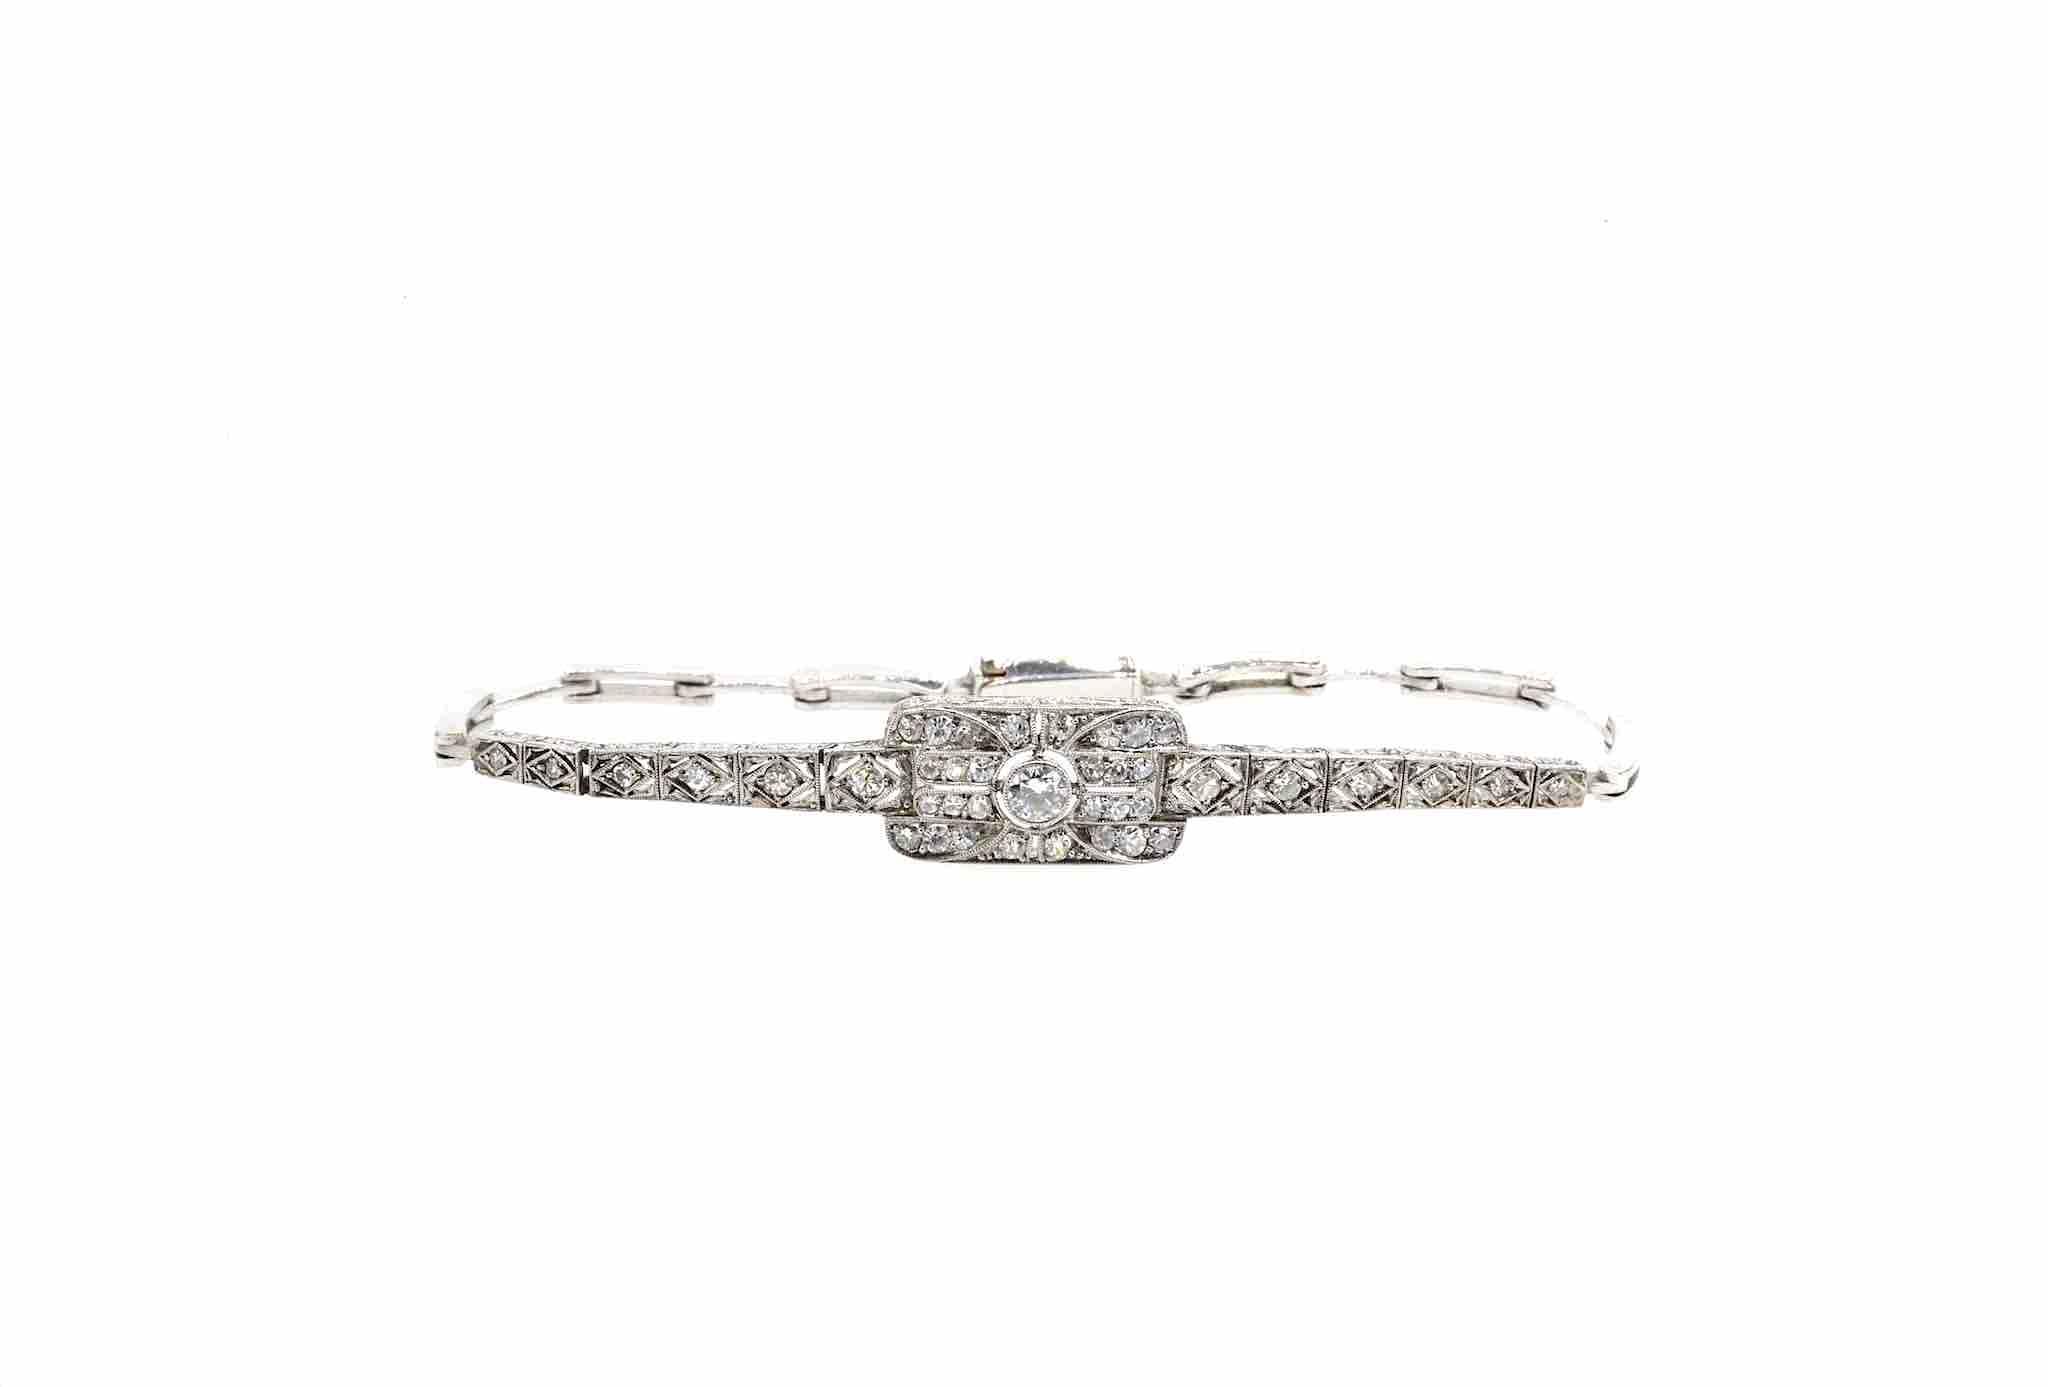 bracelet ancien diamants or 18k